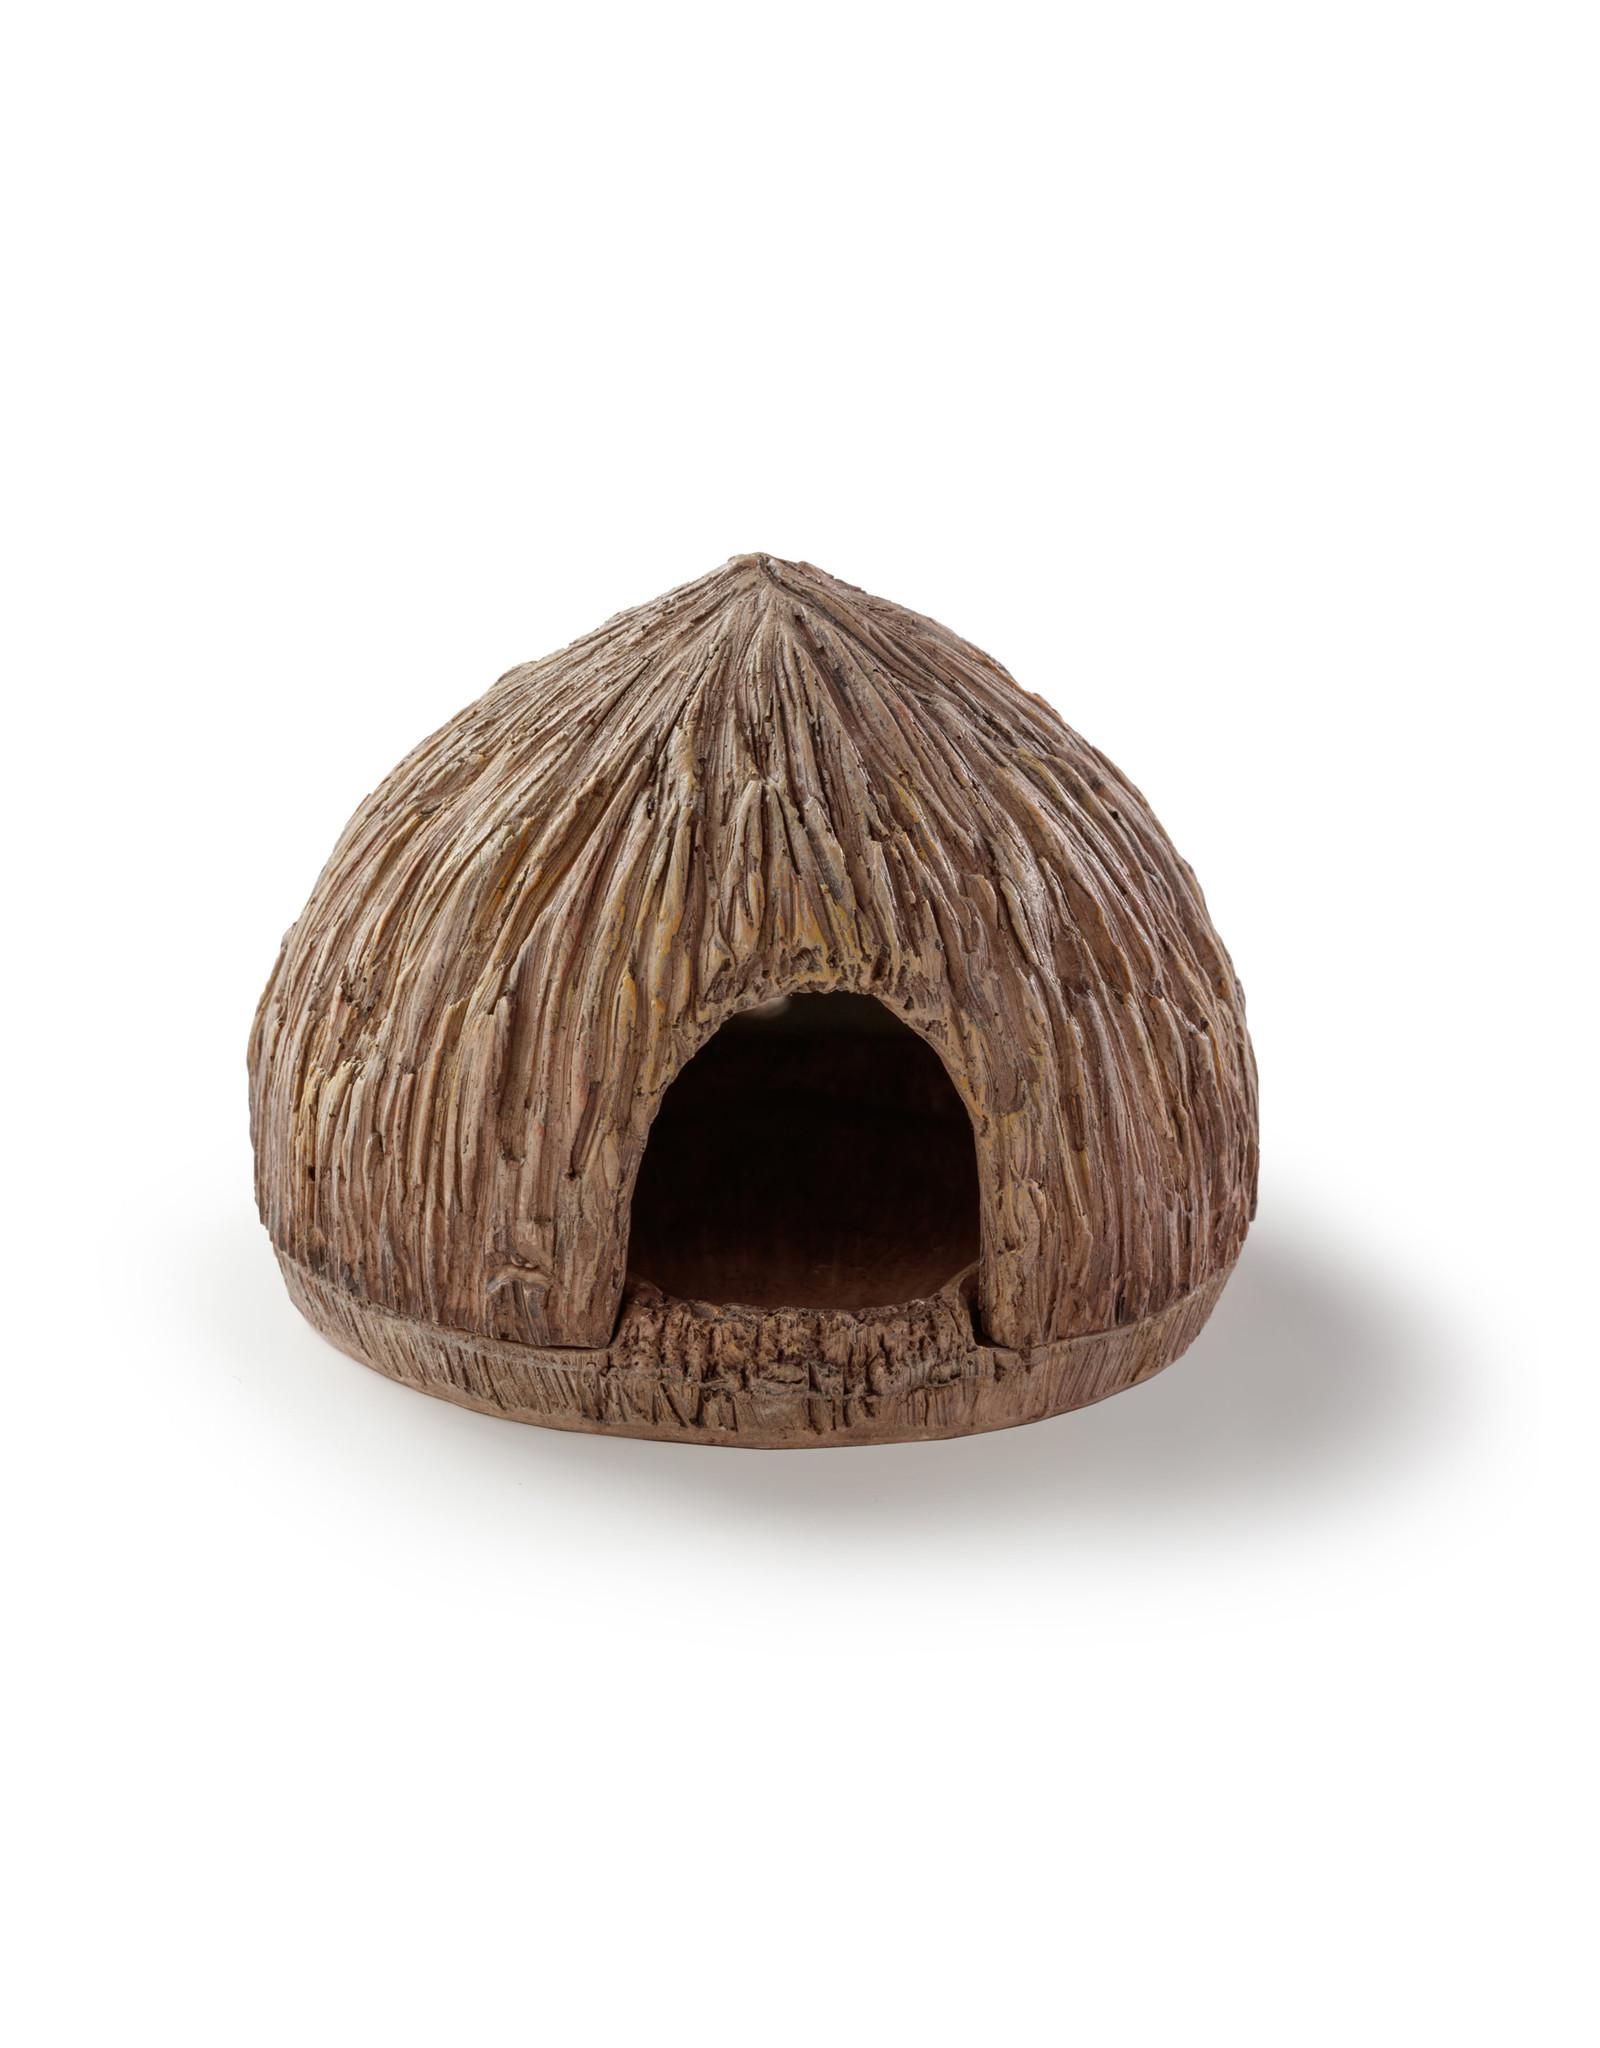 Exo Terra Exo Terra Coconut Cave Nesting & Egg-Laying Hide